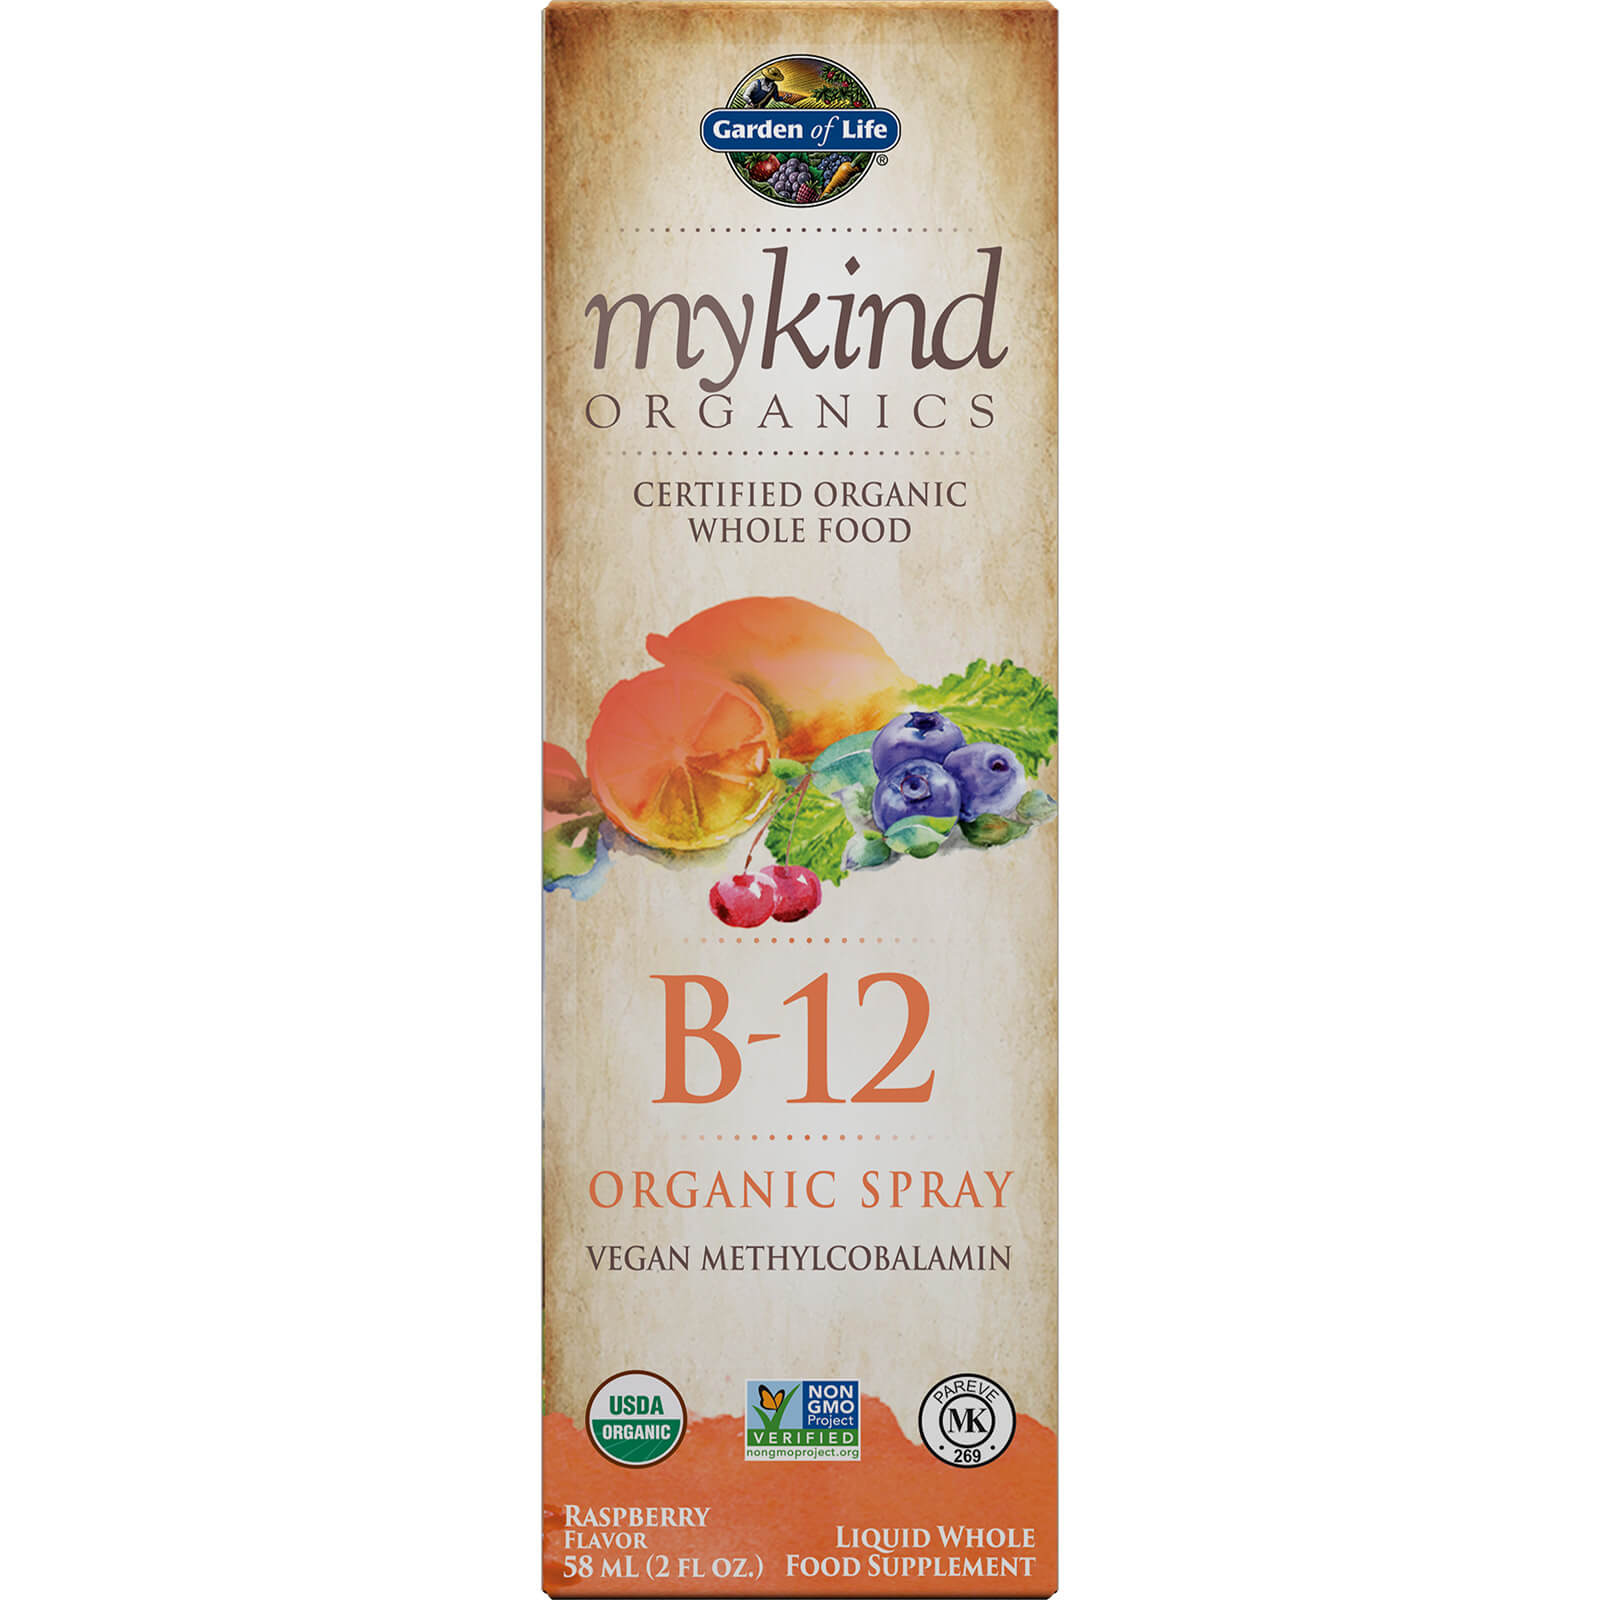 mykind Organics Vitamine B-12 Spray 58 ml